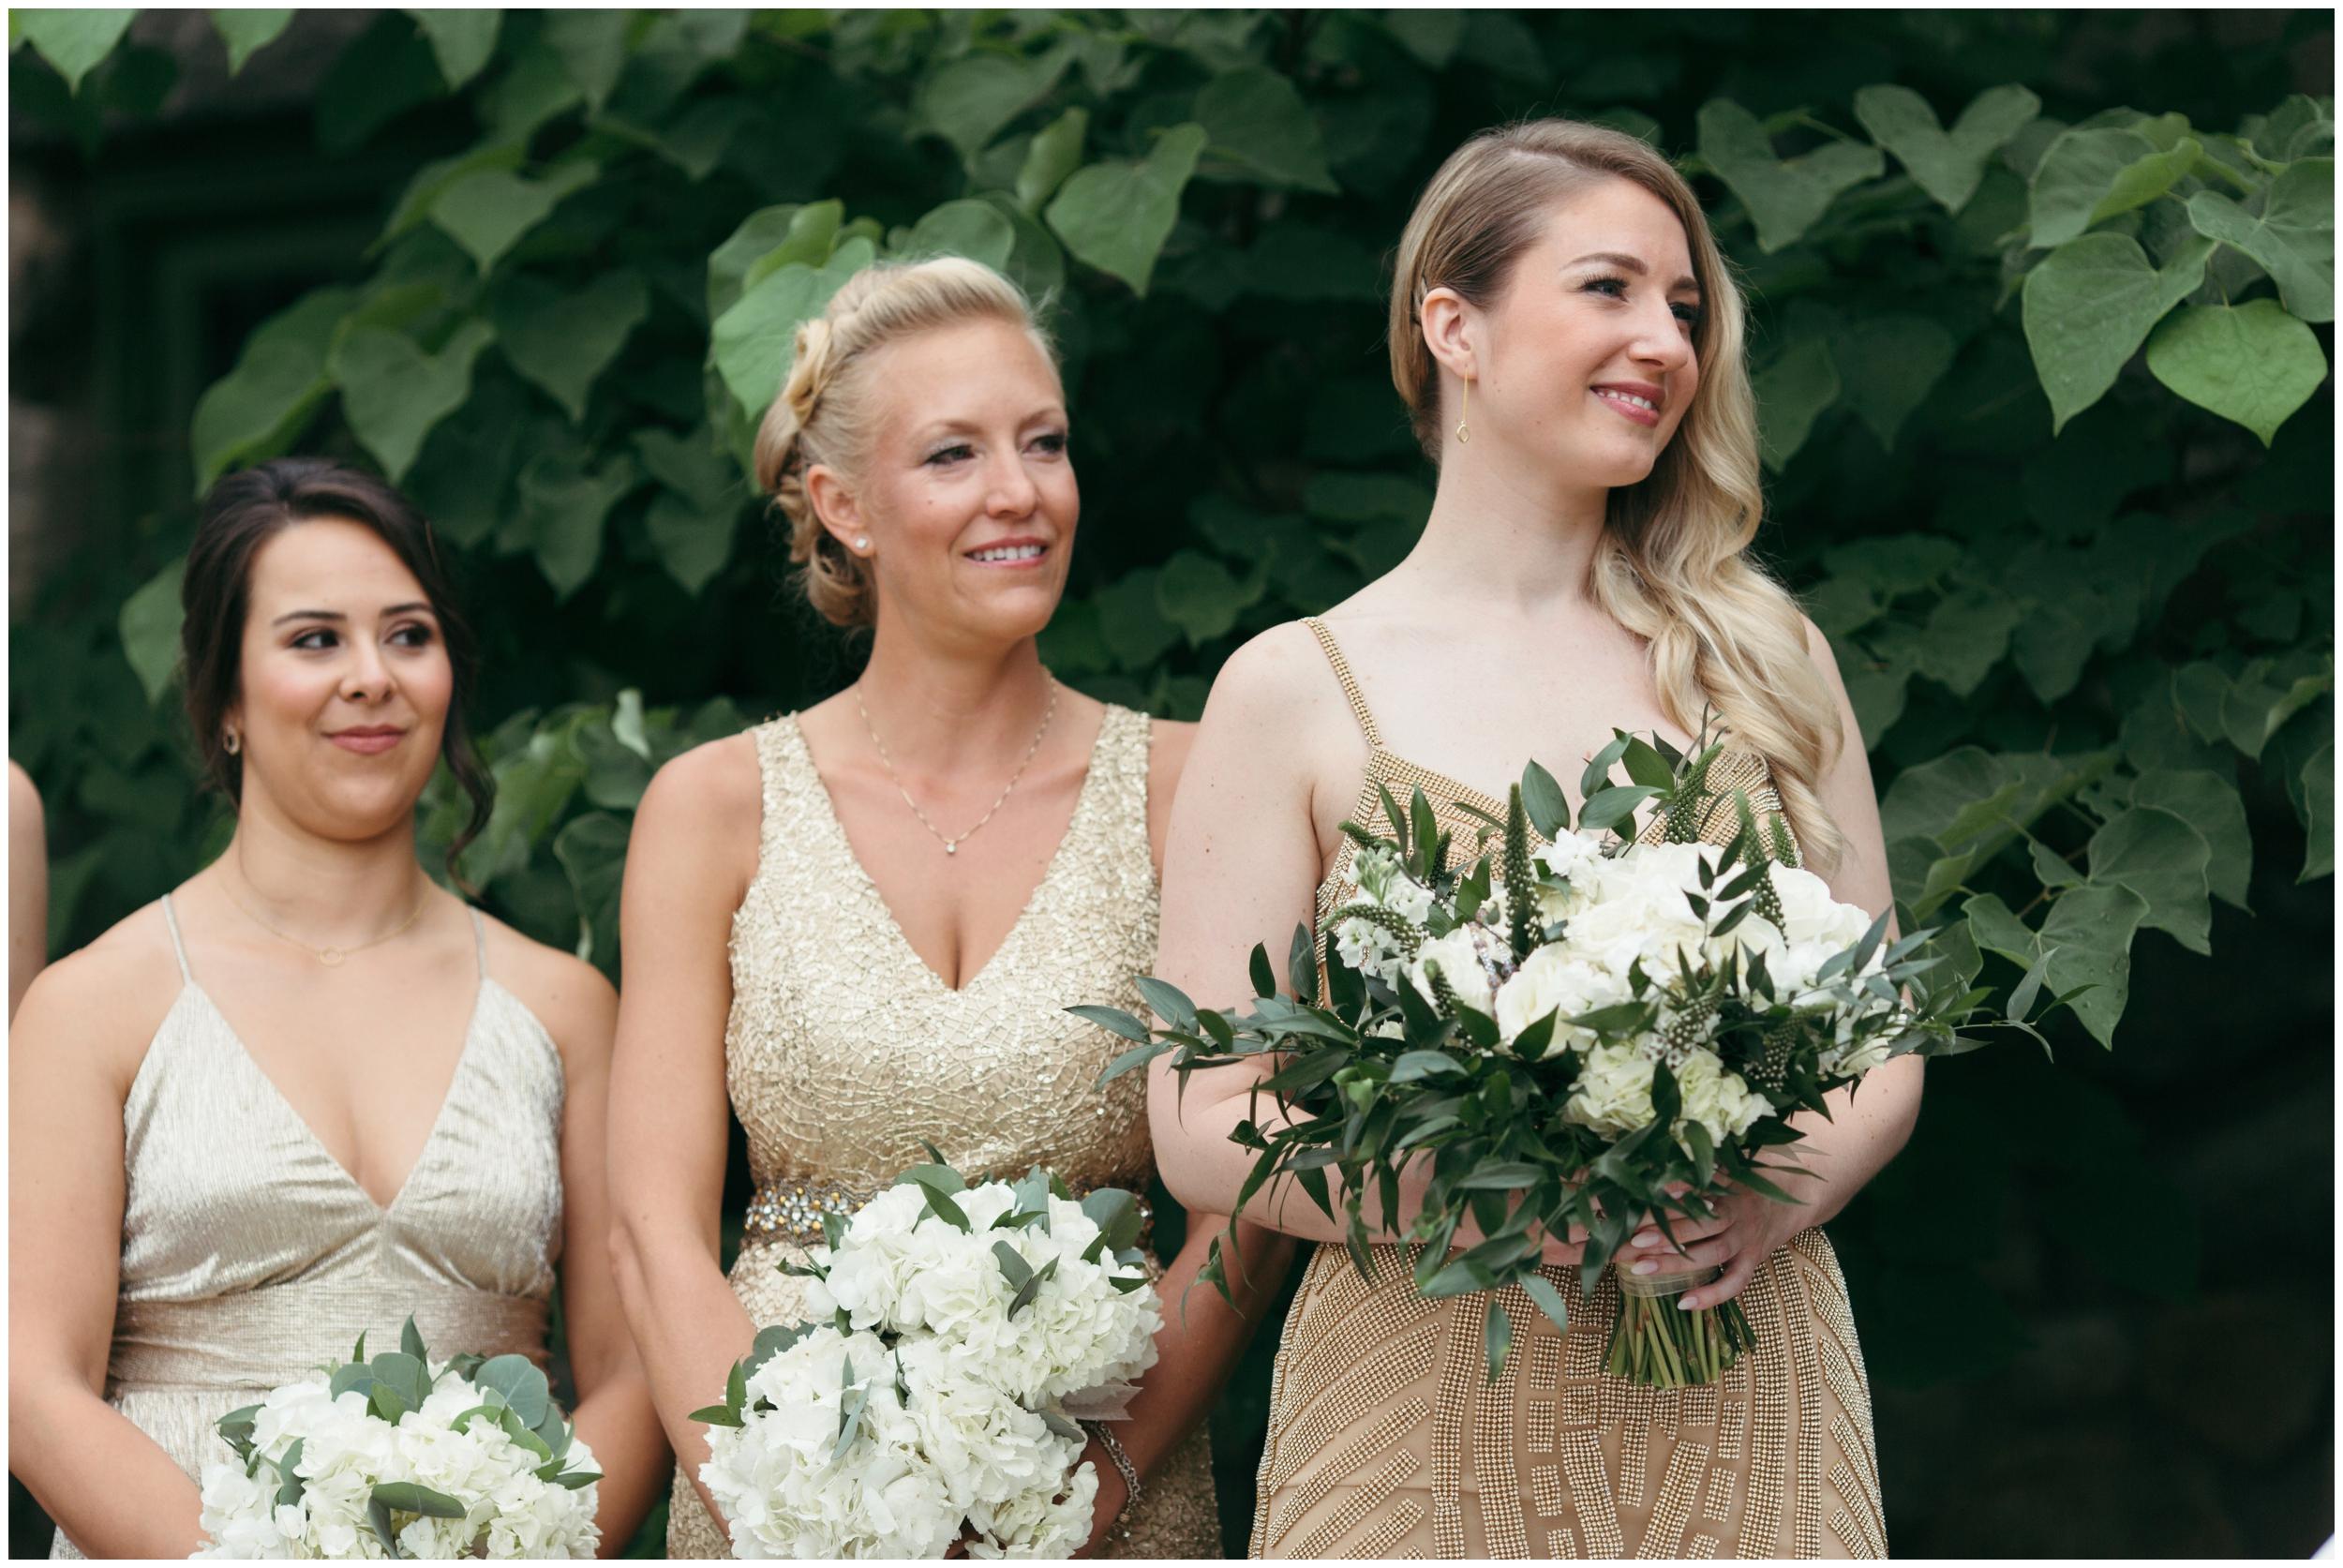 Willowdale-Estate-Wedding-Bailey-Q-Photo-Boston-Wedding-Photographer-034.JPG